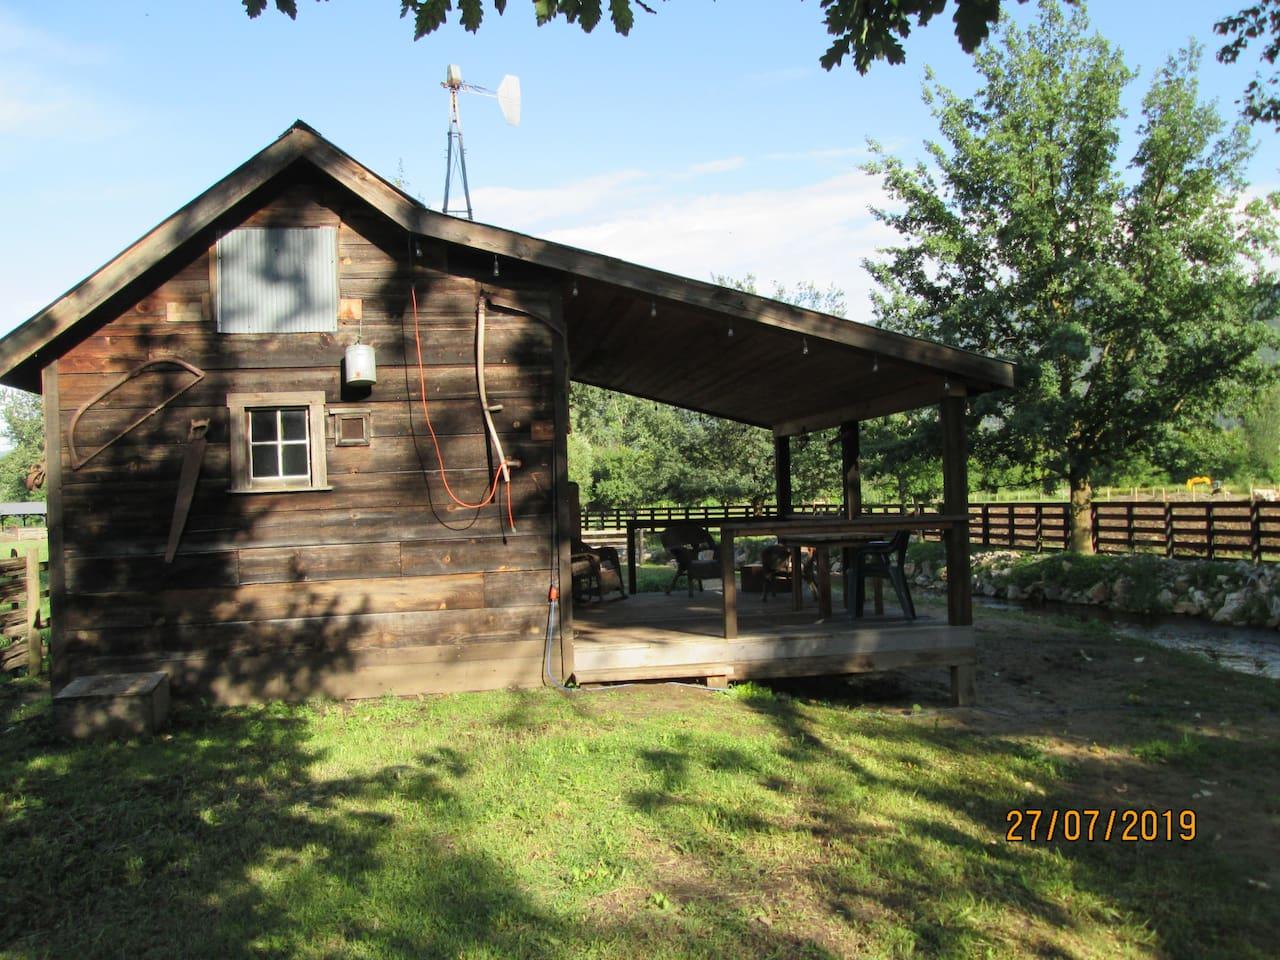 1950s Cabin reborn